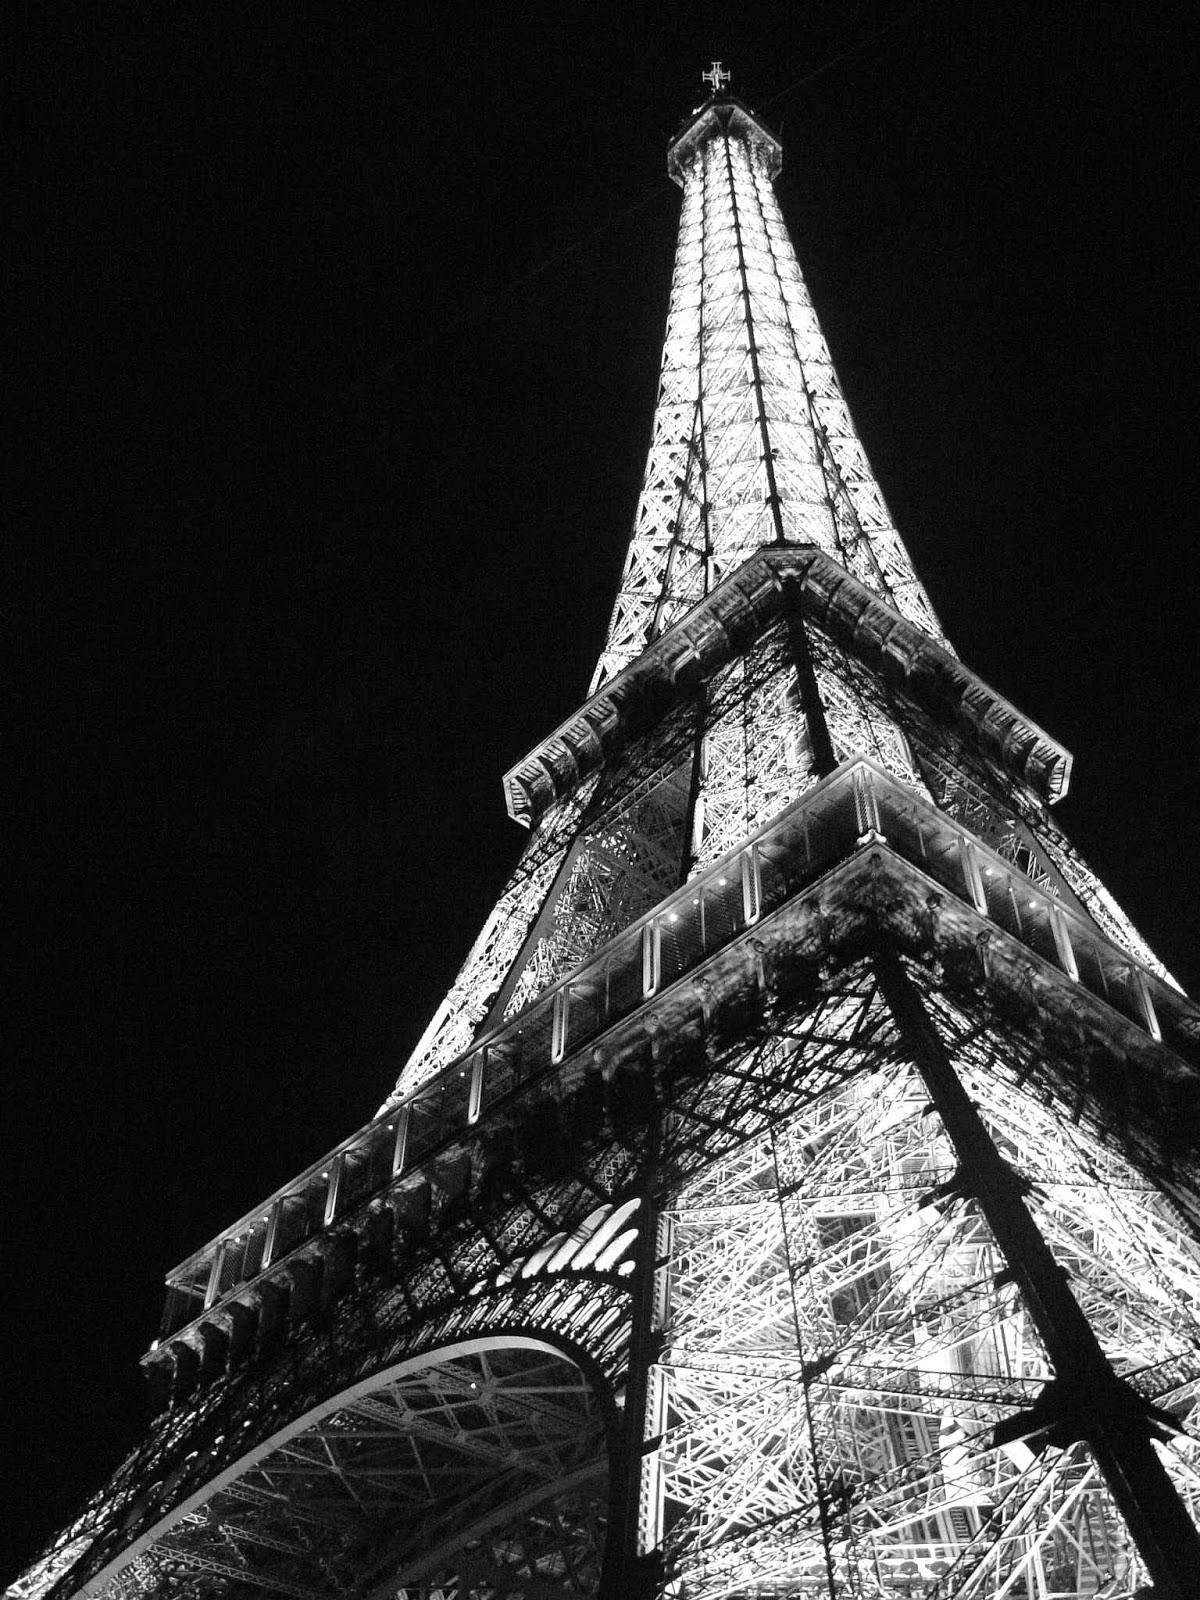 Eiffel Tower Wallpaper Black And White Eiffel Tower 46096